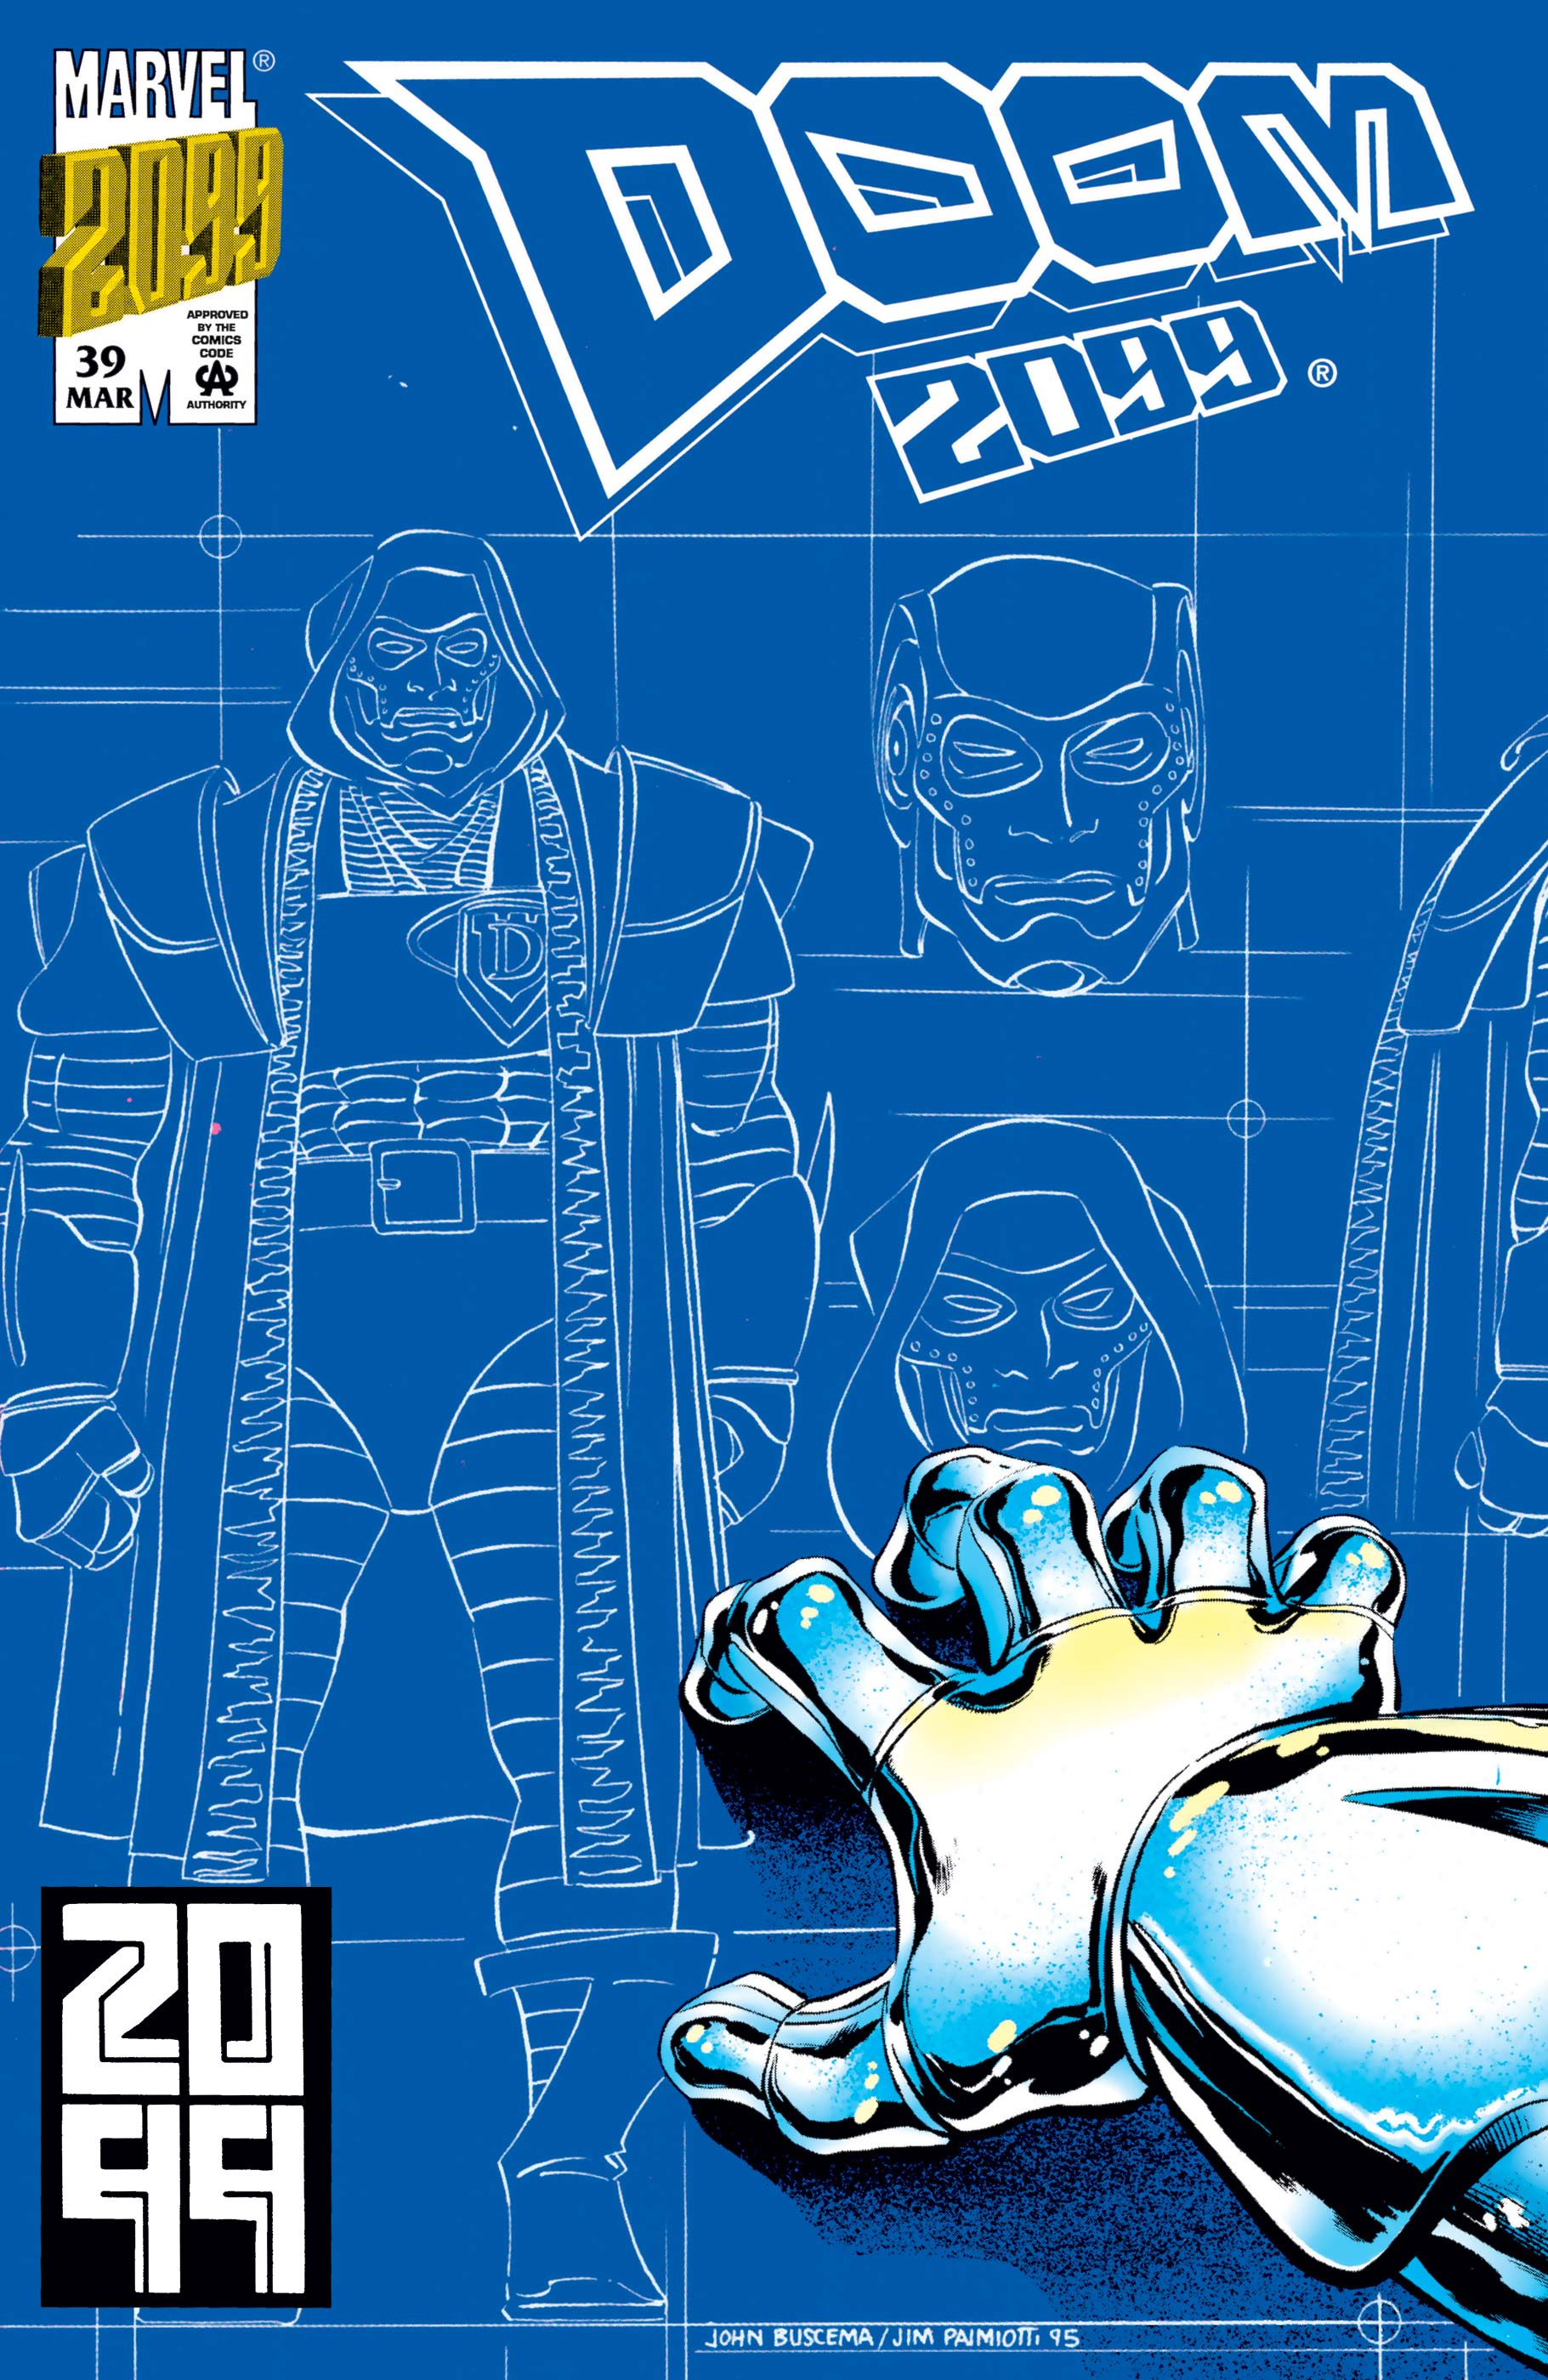 Doom 2099 (1993) #39